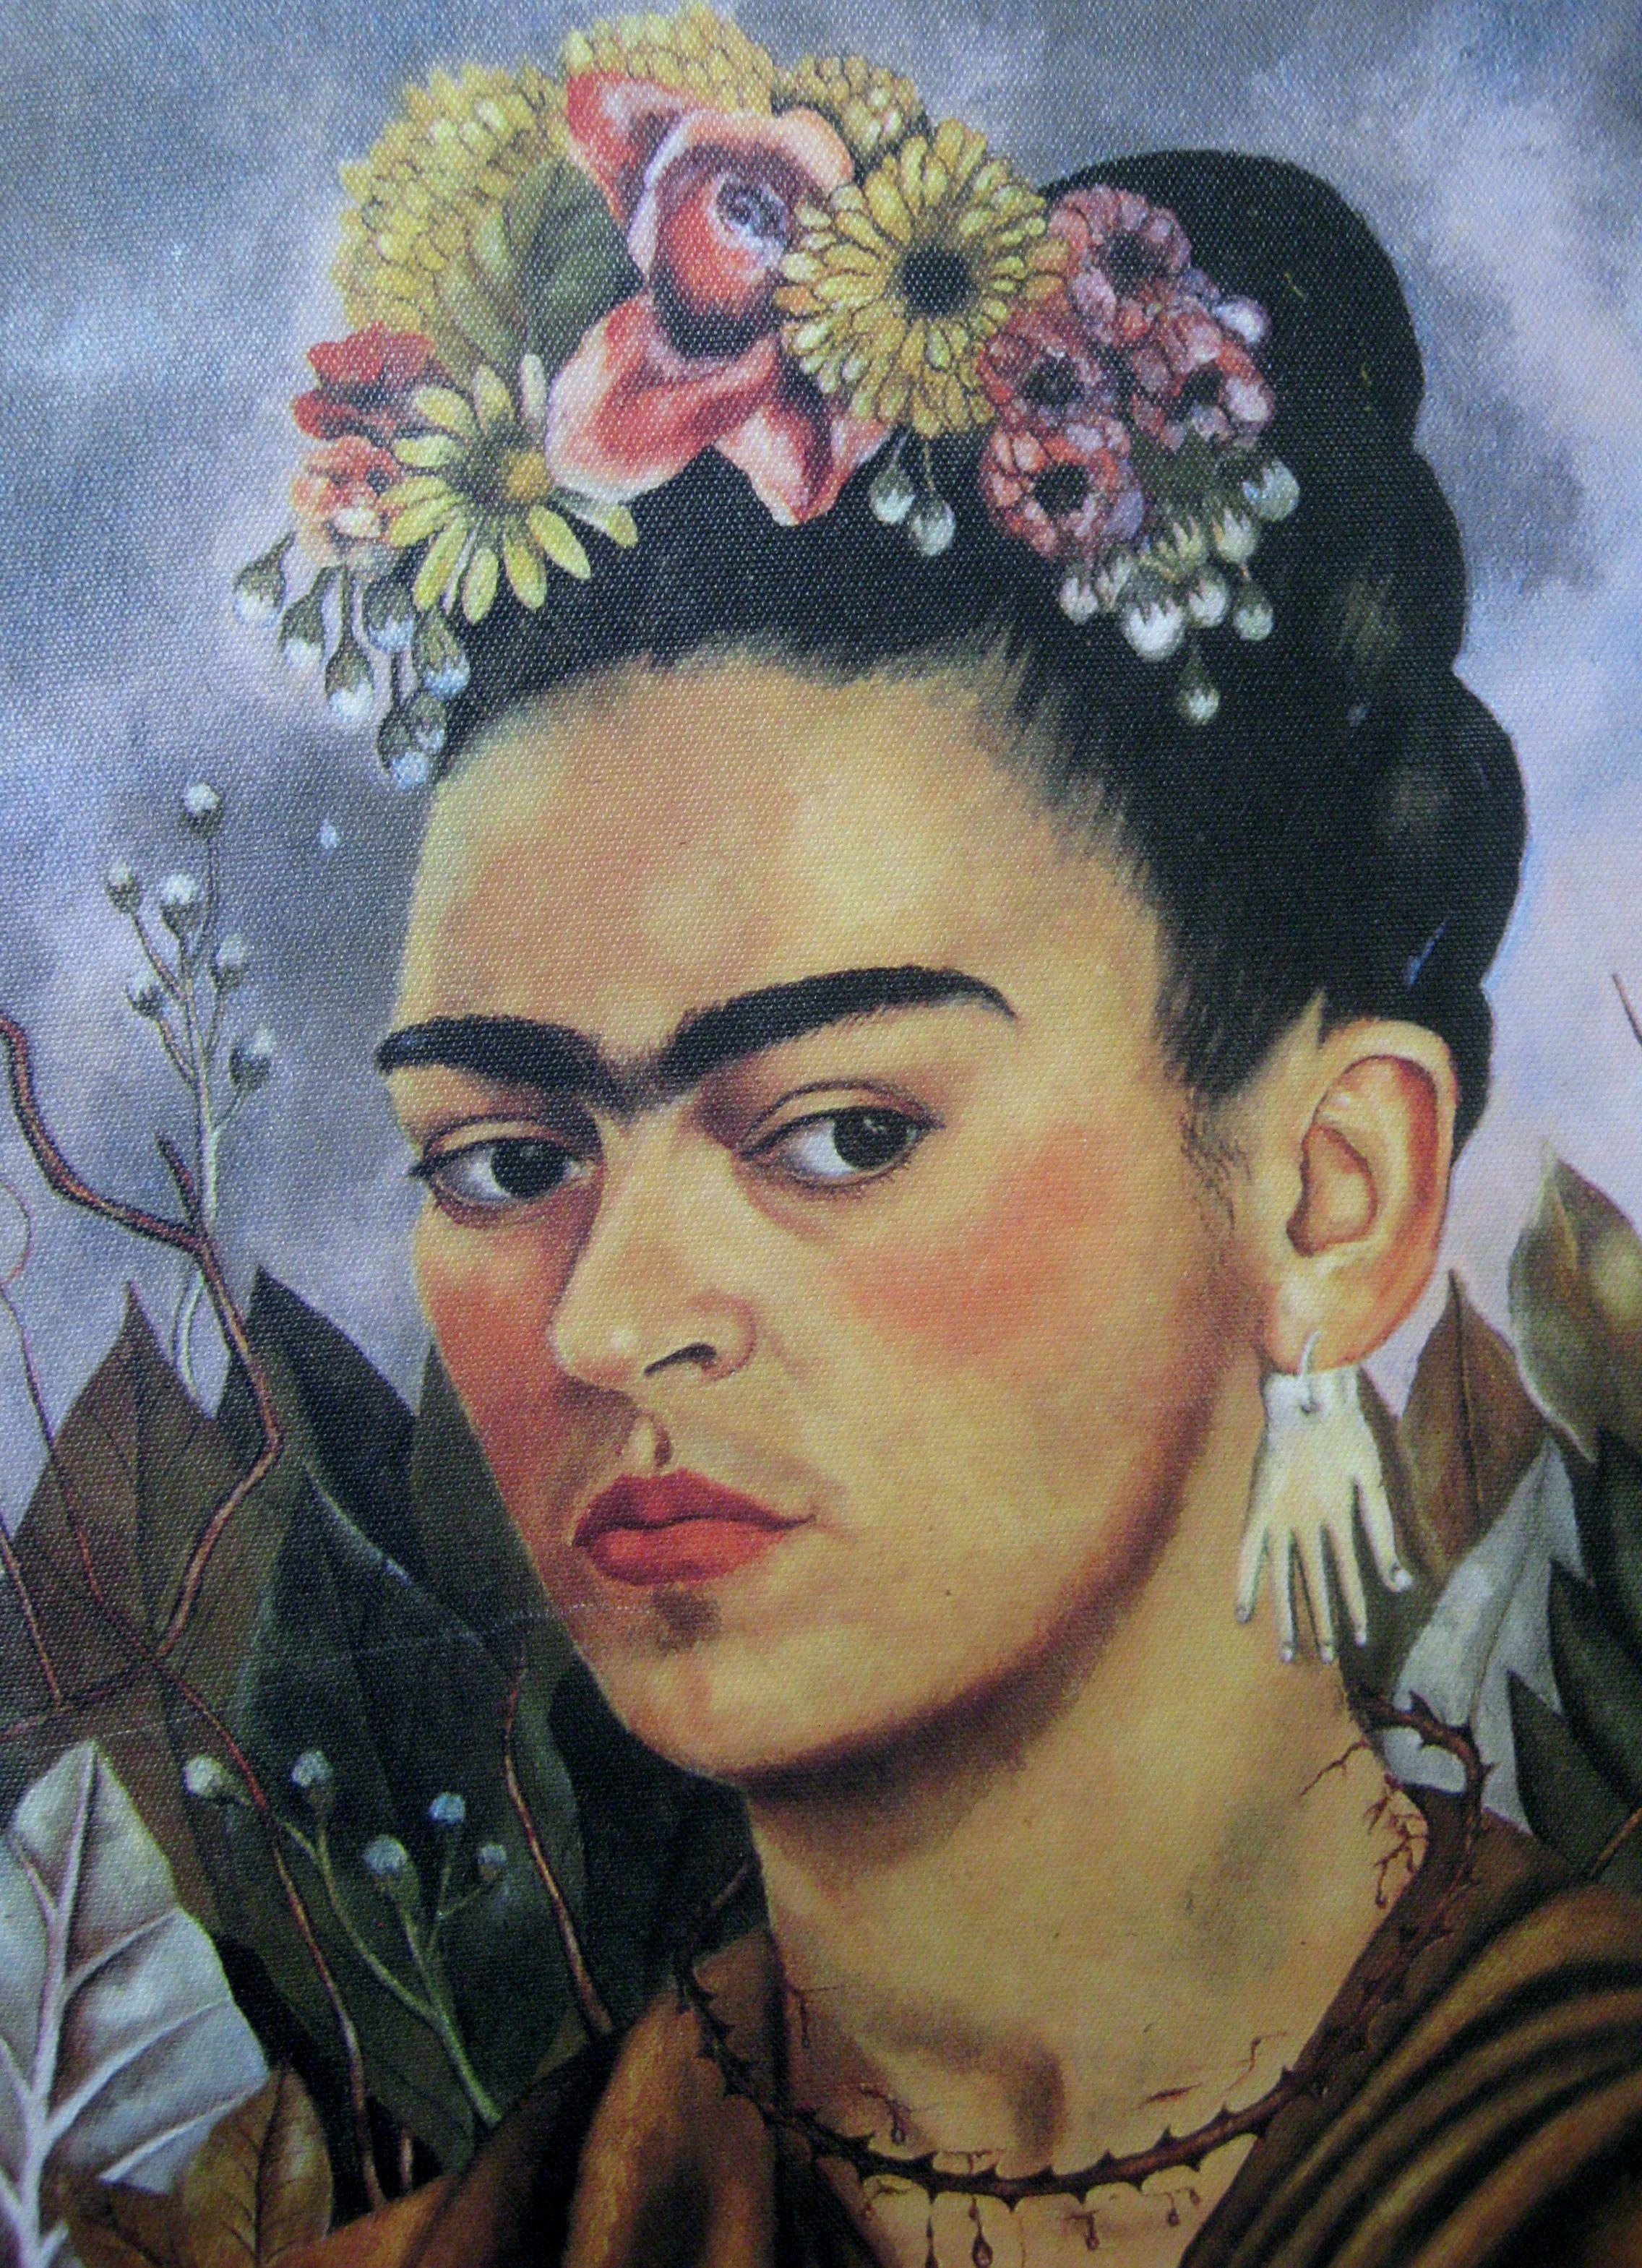 Frieda Kahlo, 1907-1954.   Frida Kalo   Frida kahlo, Artiste et Peintre